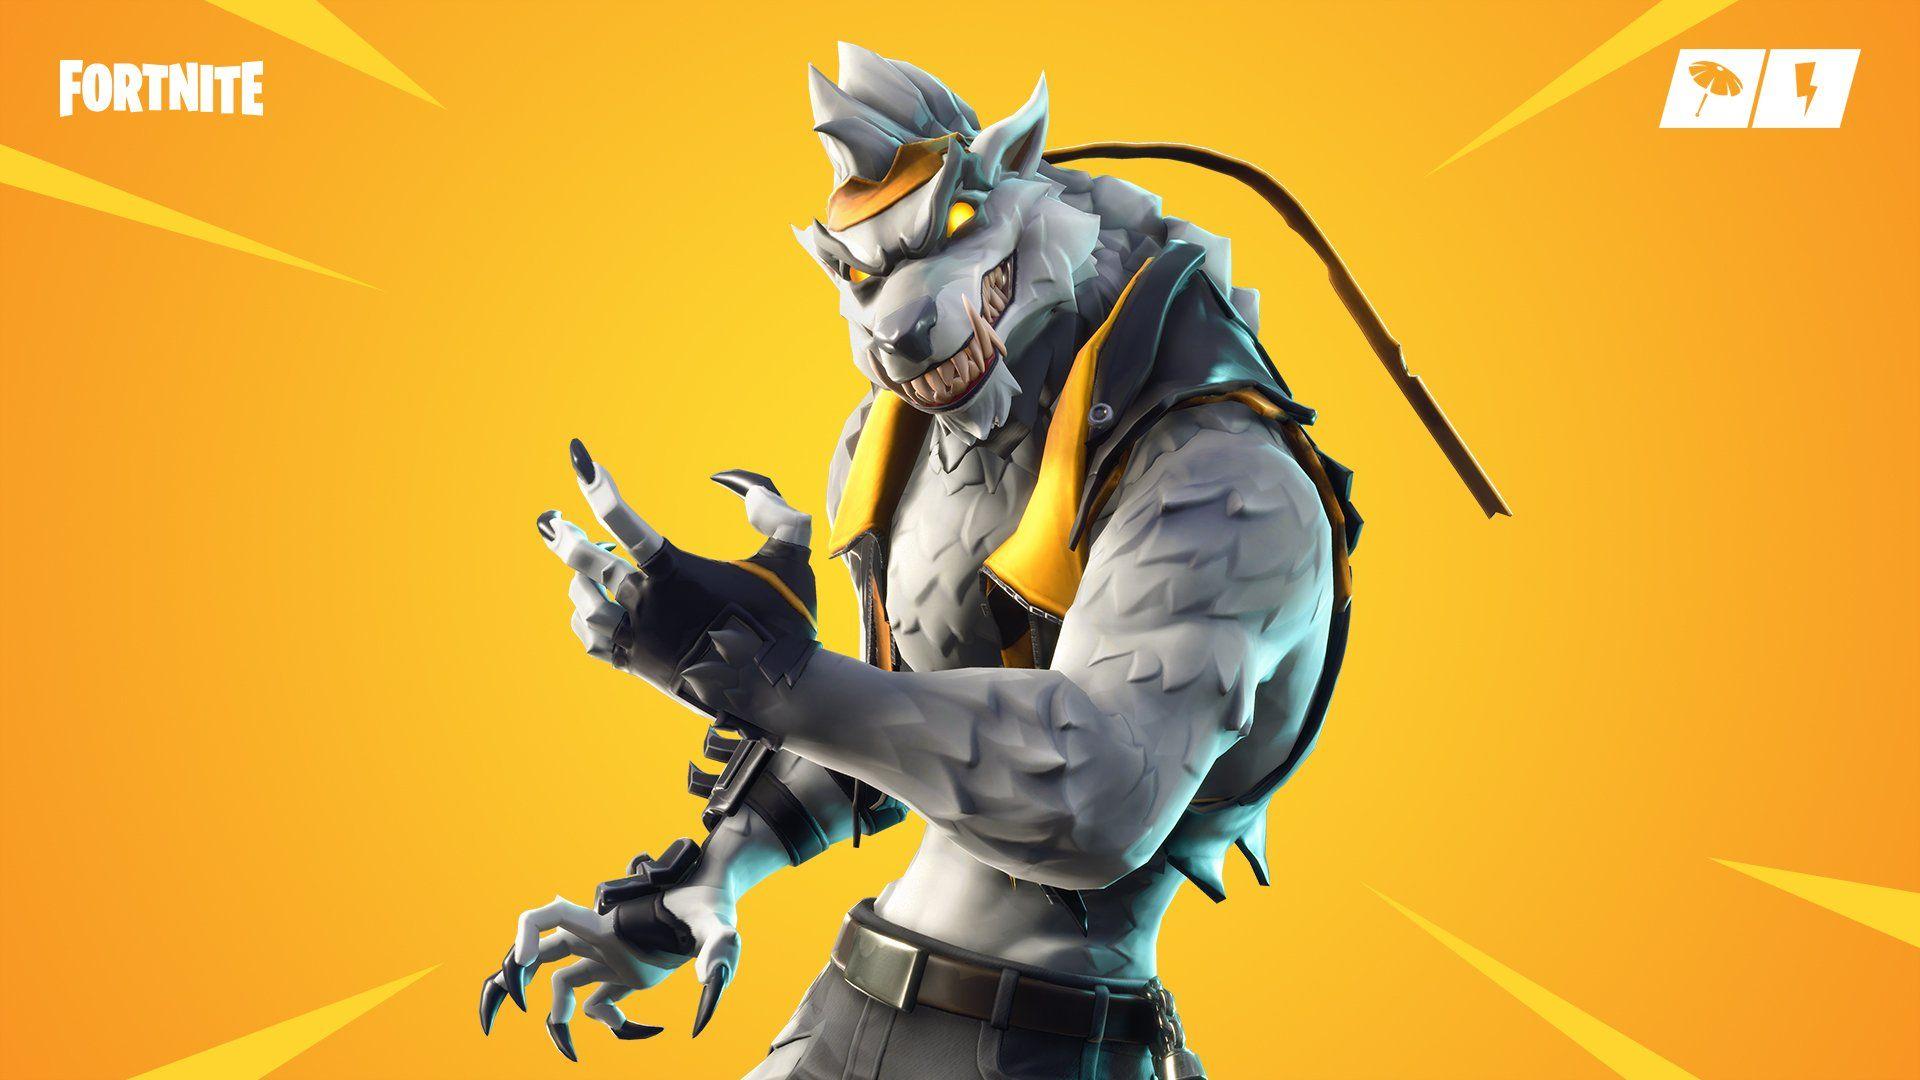 Fortnite On In 2019 Kids Epic Games Fortnite Epic Games Epic